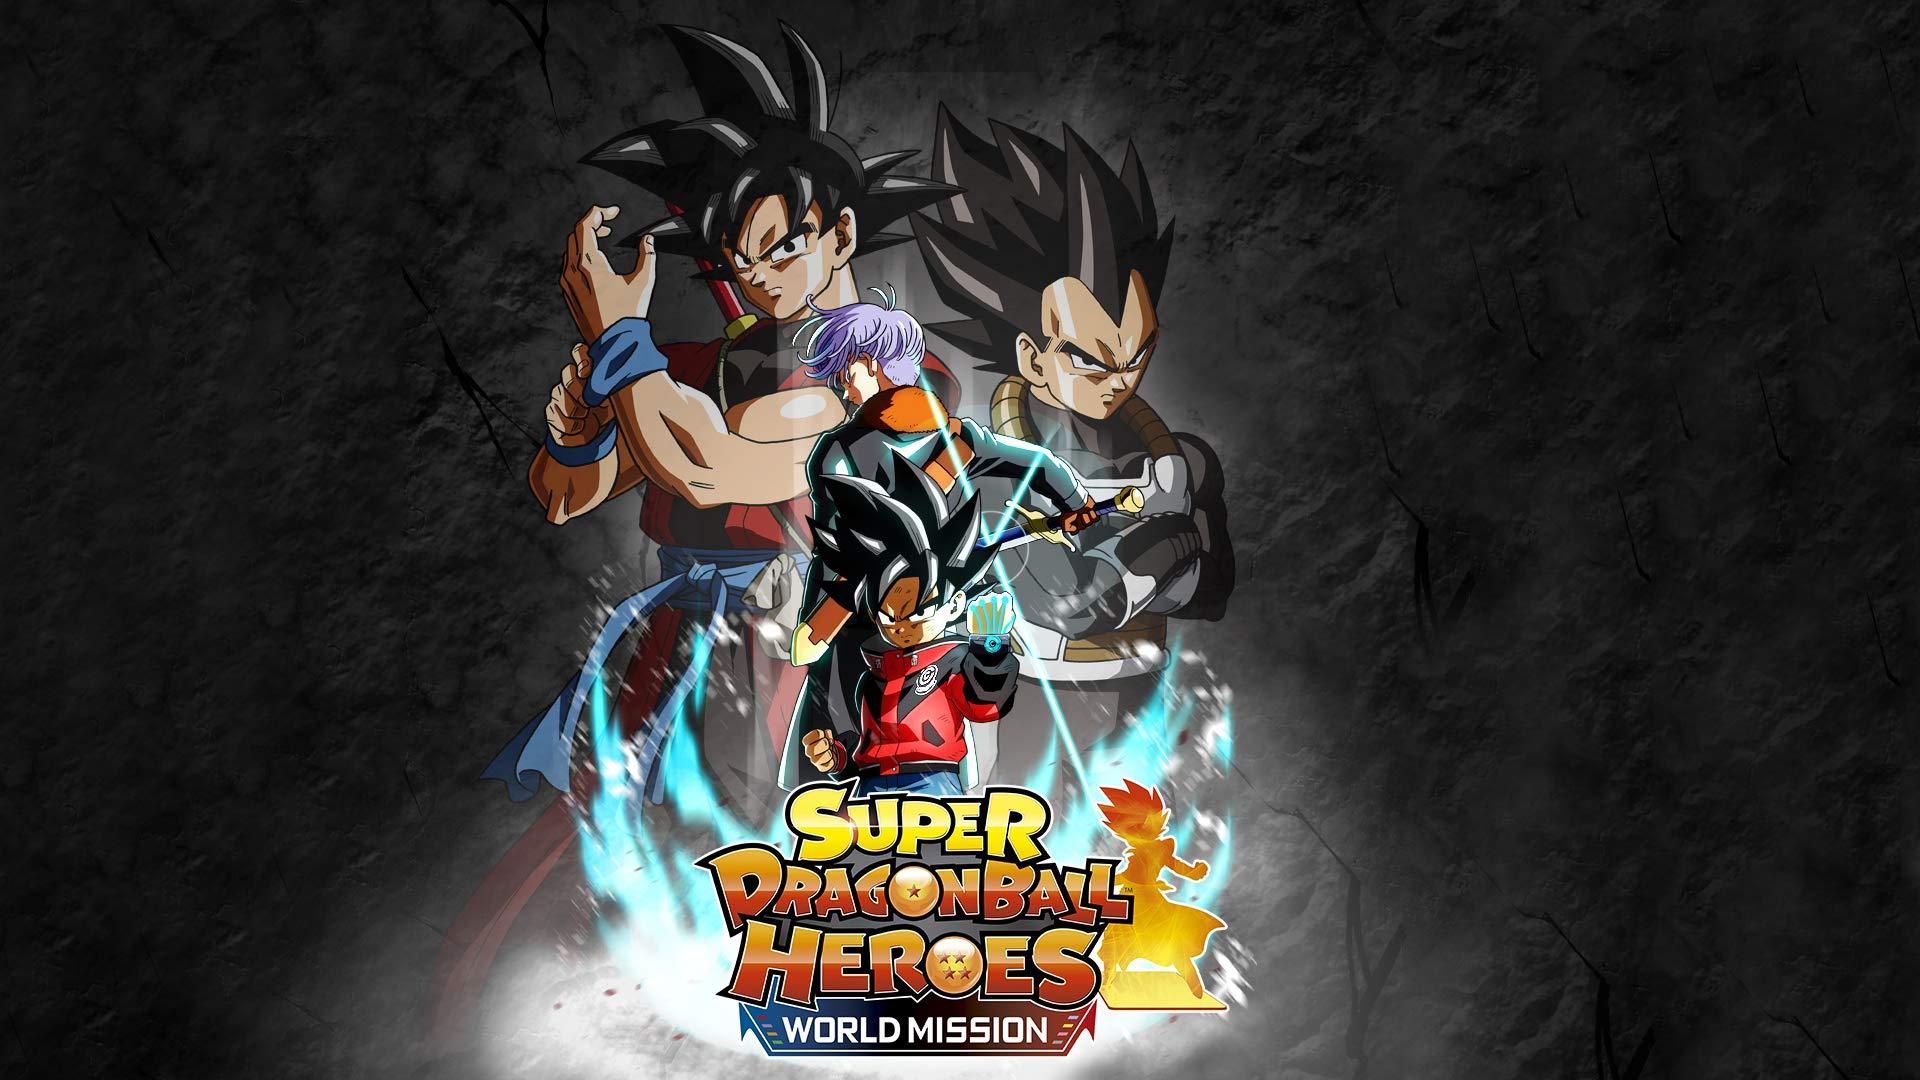 SUPER DRAGON BALL HEROES WORLD MISSION - Nintendo Switch [Digital Code]